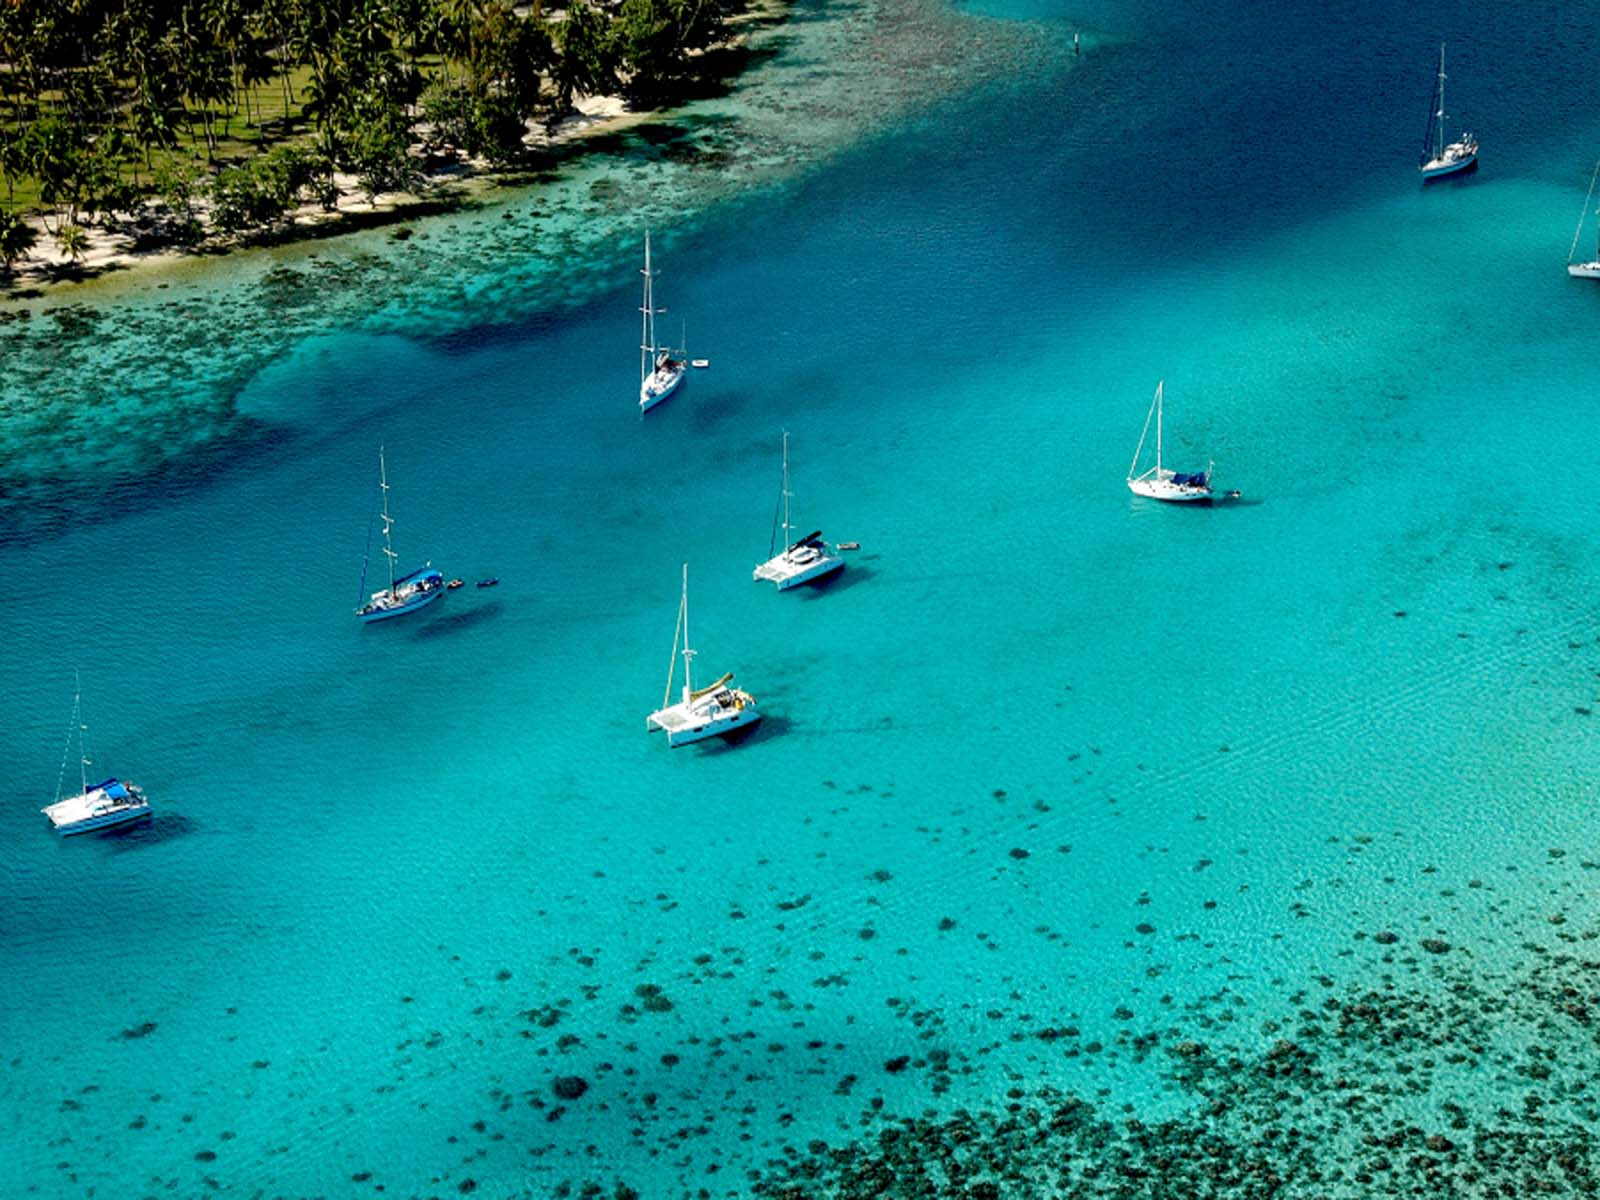 Fond ecran mer gratuit pacifique ocean indien for Images gratuites fond ecran mer